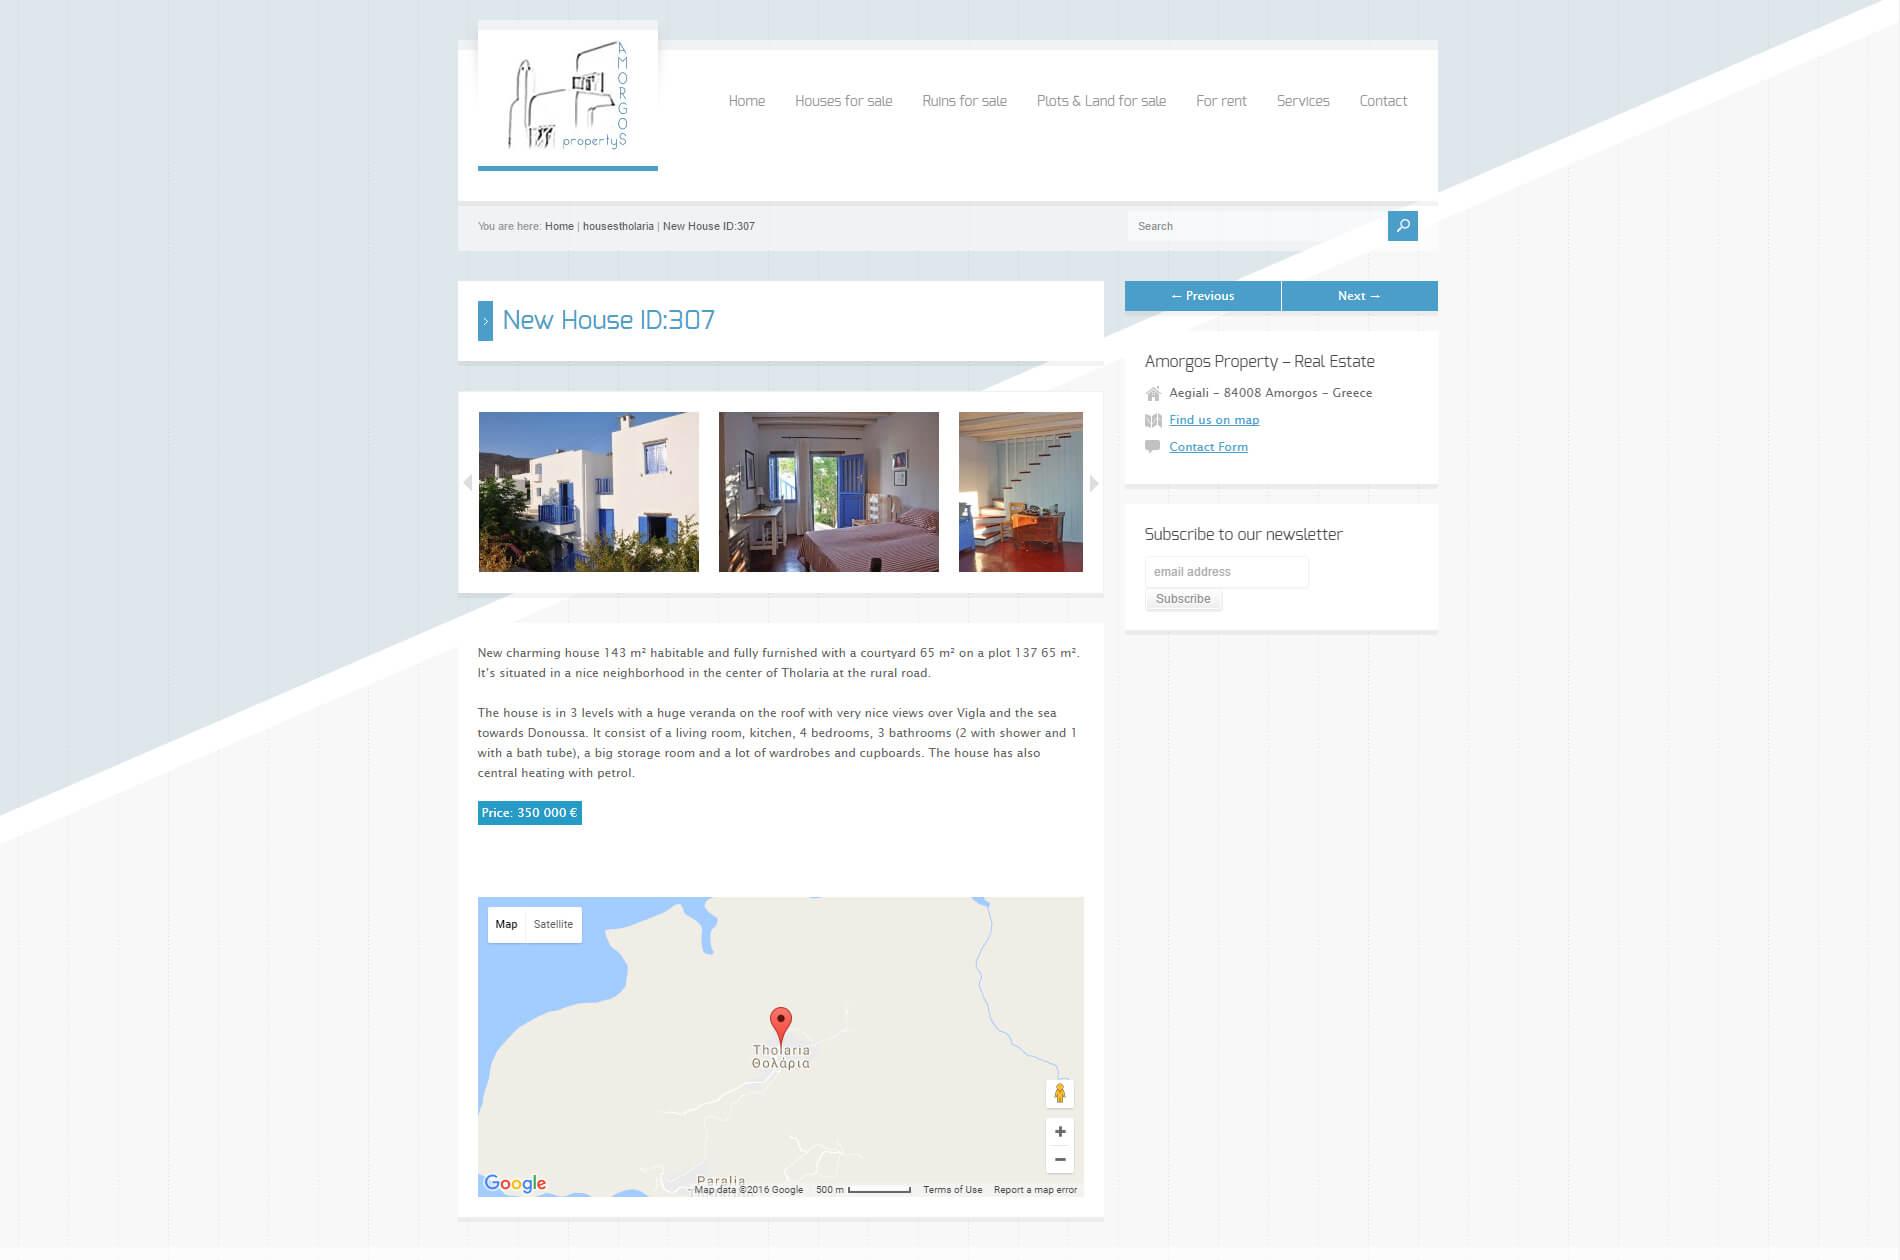 anweb webbdesing Amorgos Property Fastighetsbyrå